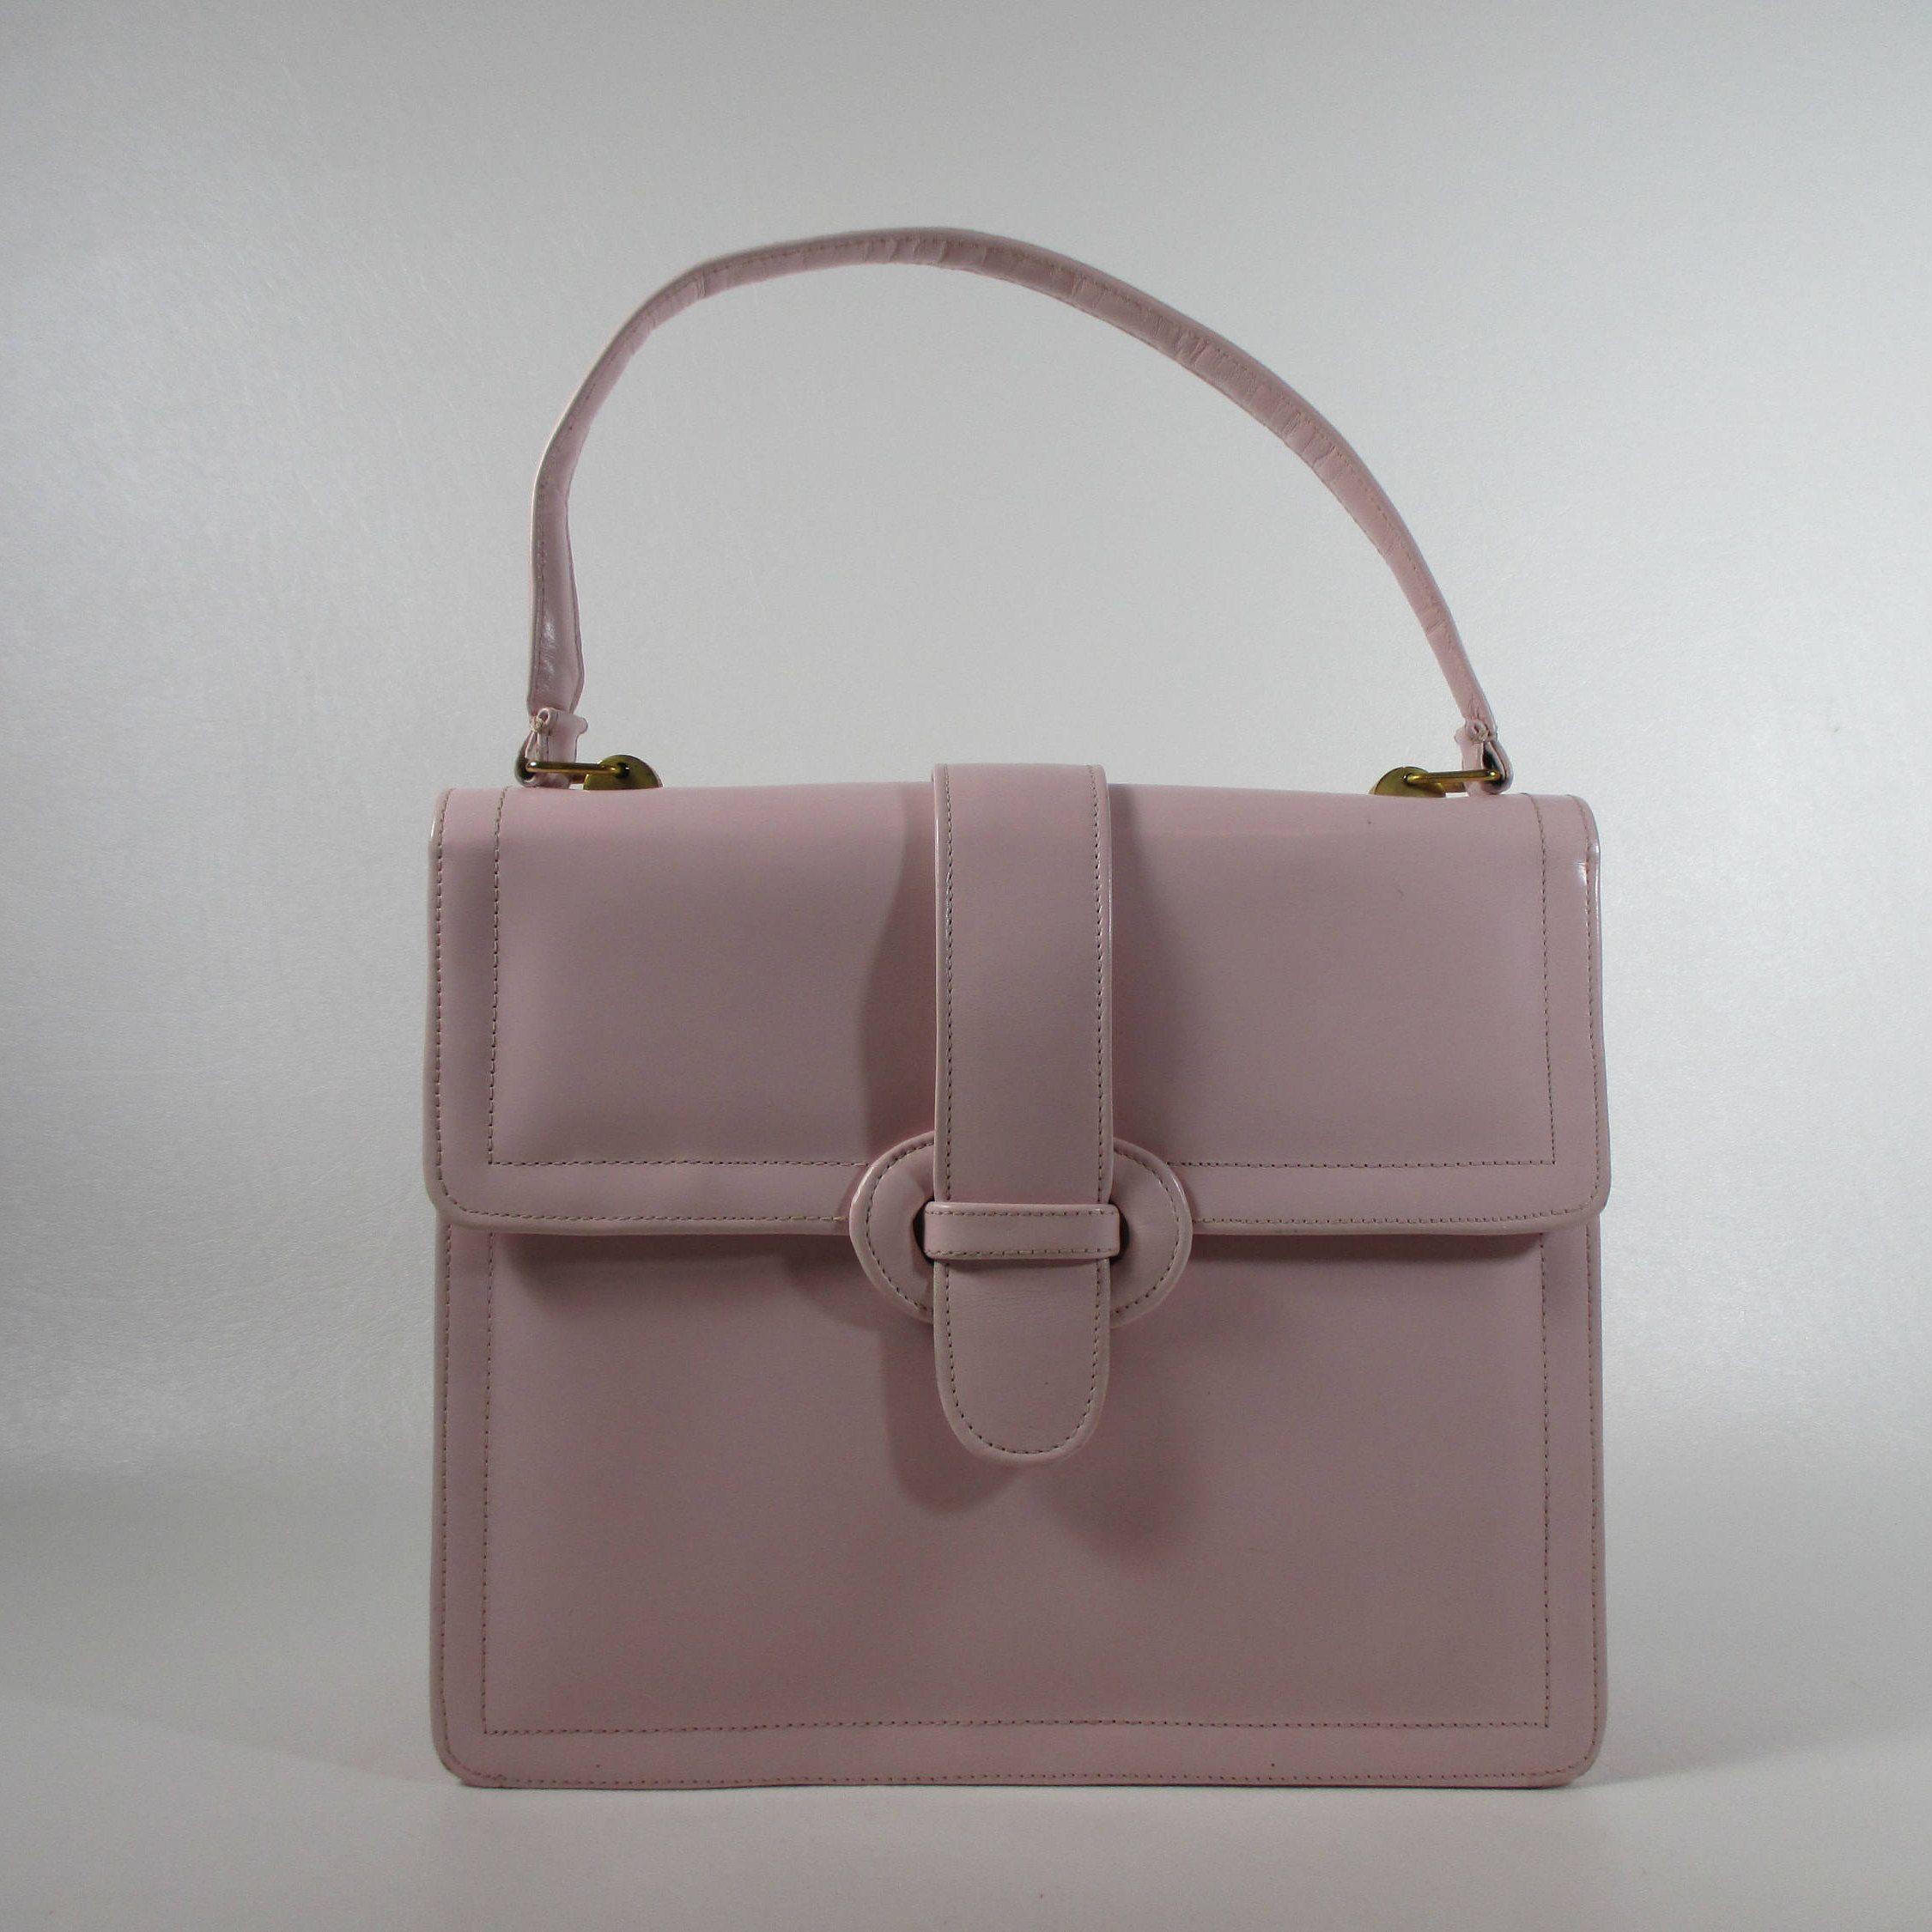 Vintage Pink Leather Kelly Bag Pale Handbag Light Purse 1950s Classic Top Handle 60s Mod Pocketbook By Bob Shoe